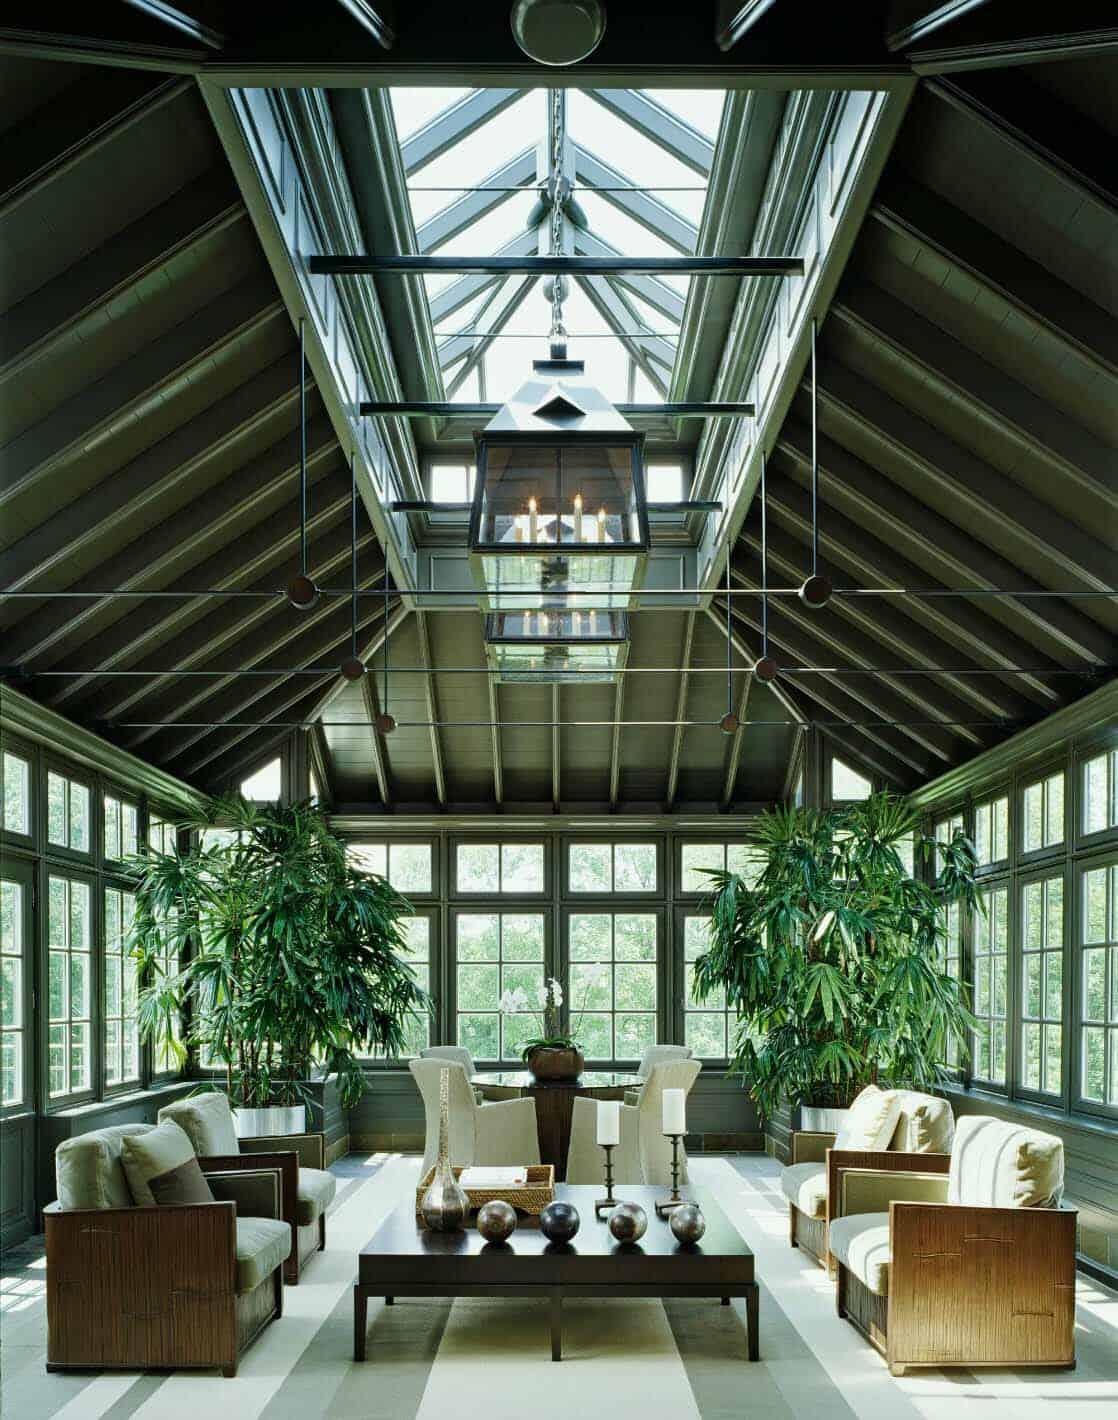 Amazing-Conservatory-Greenhouse-Ideas-24-1-Kindesign